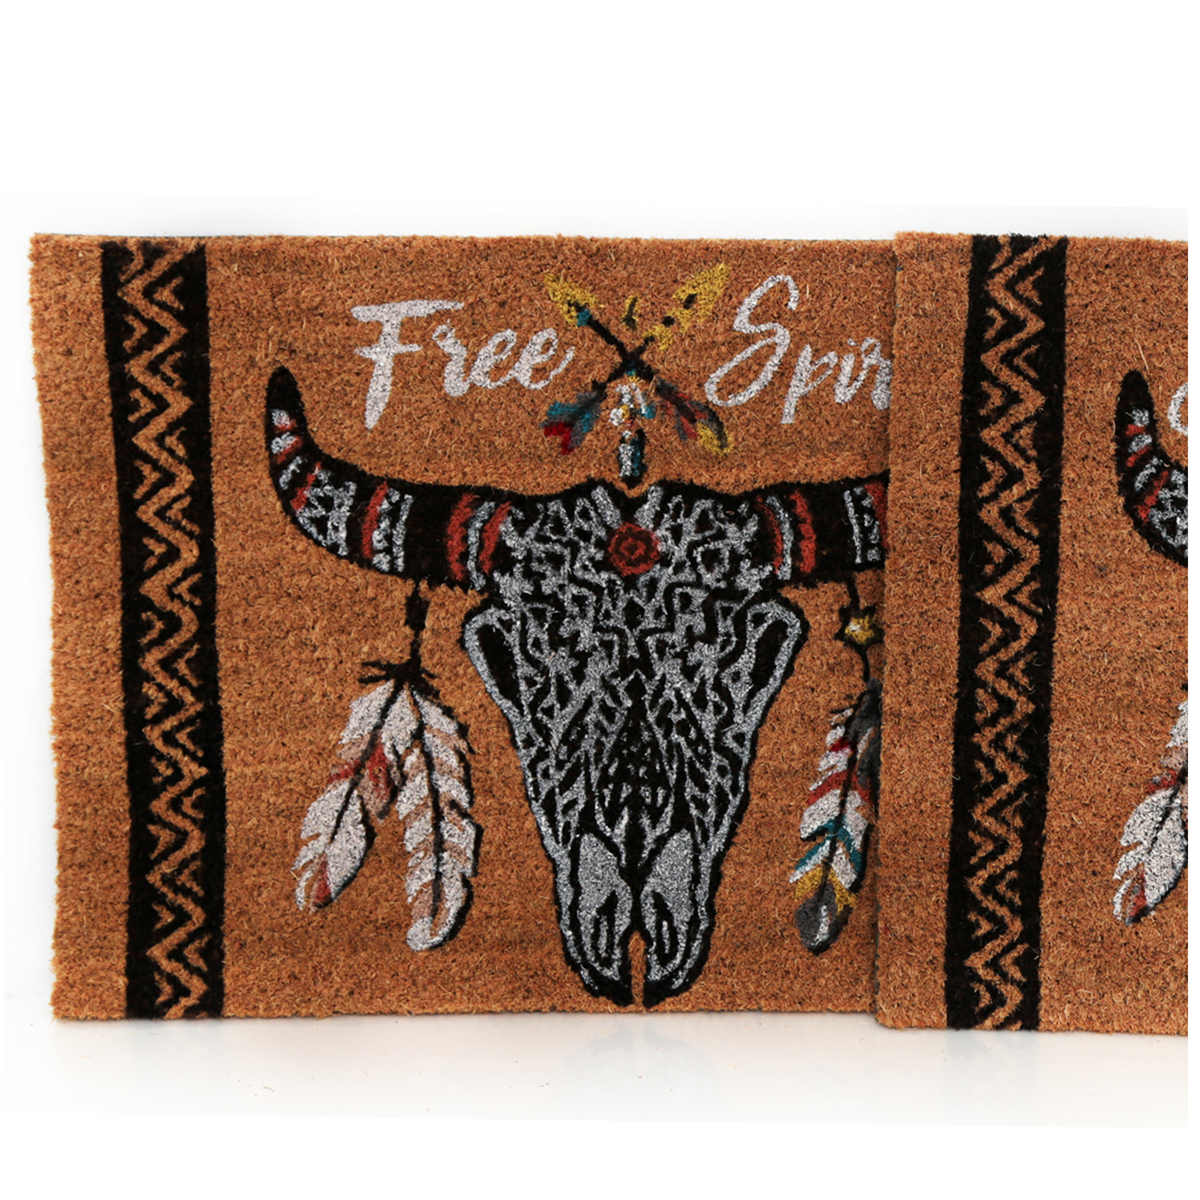 Paillasson paille \'Boho\' (Crâne de bison, Free spirit) - 60x40 cm - [A0019]